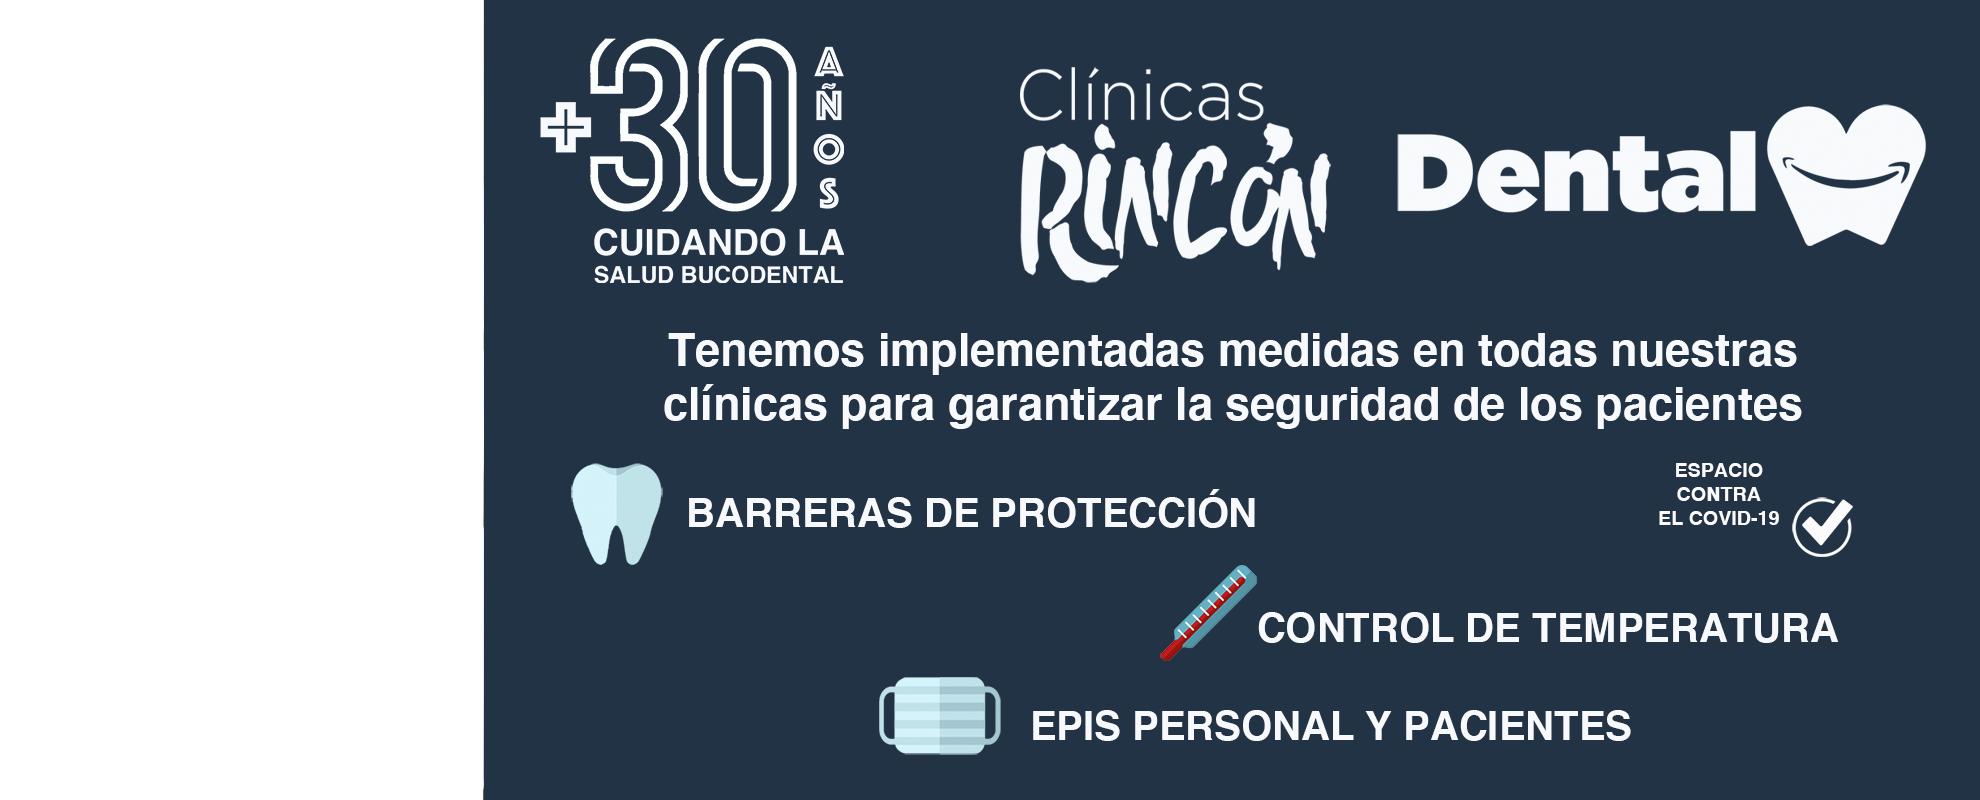 medidasdeseguridad-covid19-clinicasrincondental